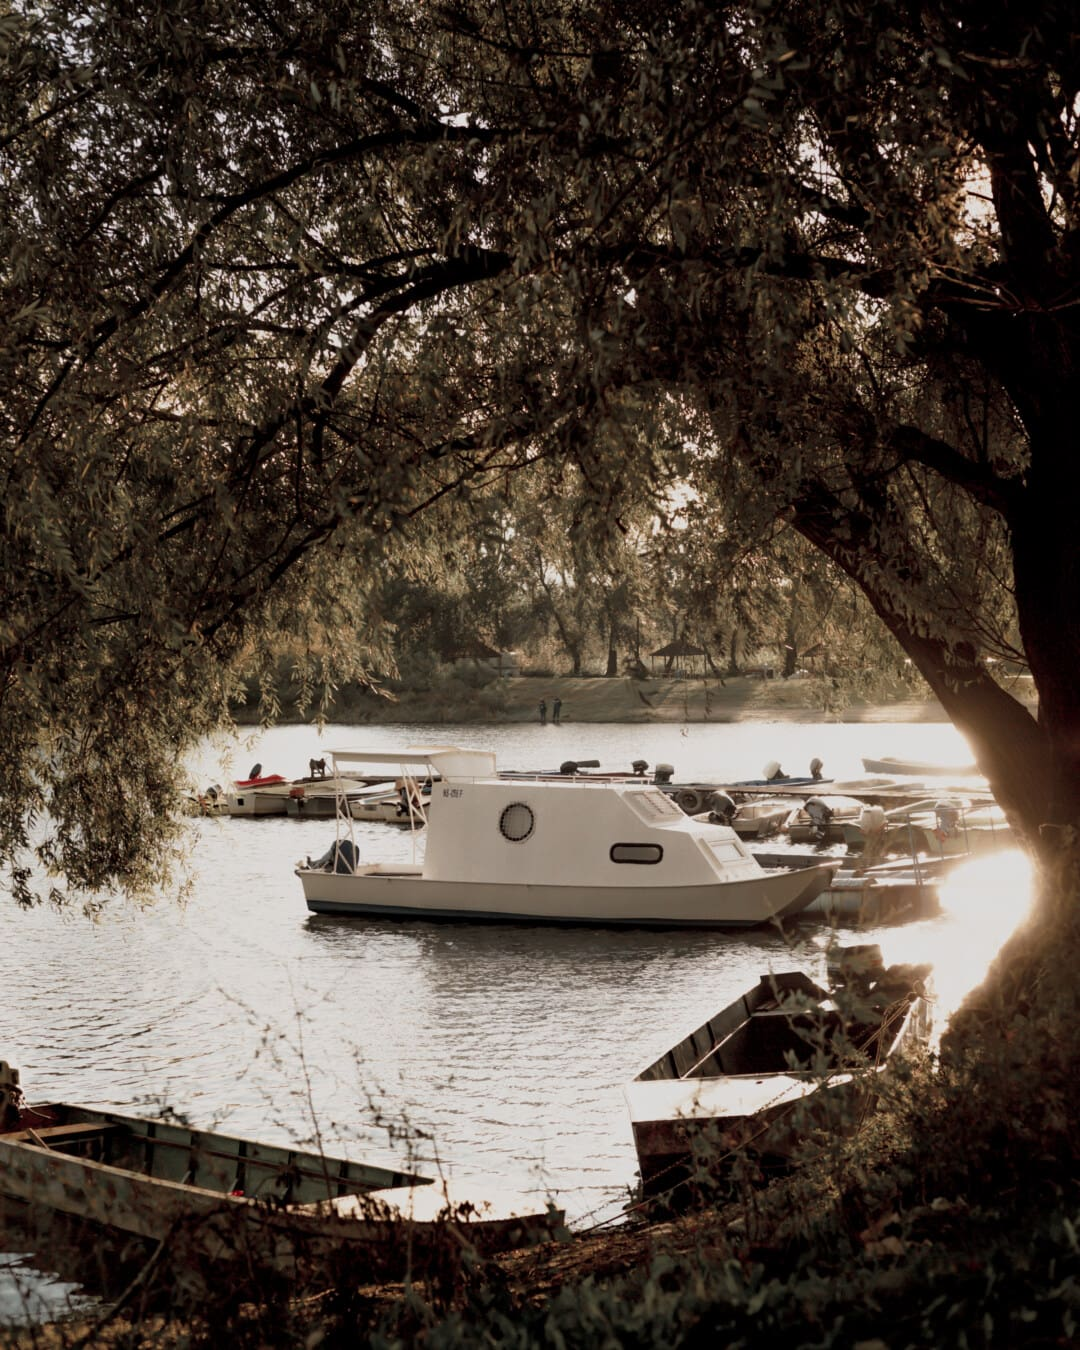 water, shore, boat, lakeside, lake, speedboat, sea, motorboat, river, landscape